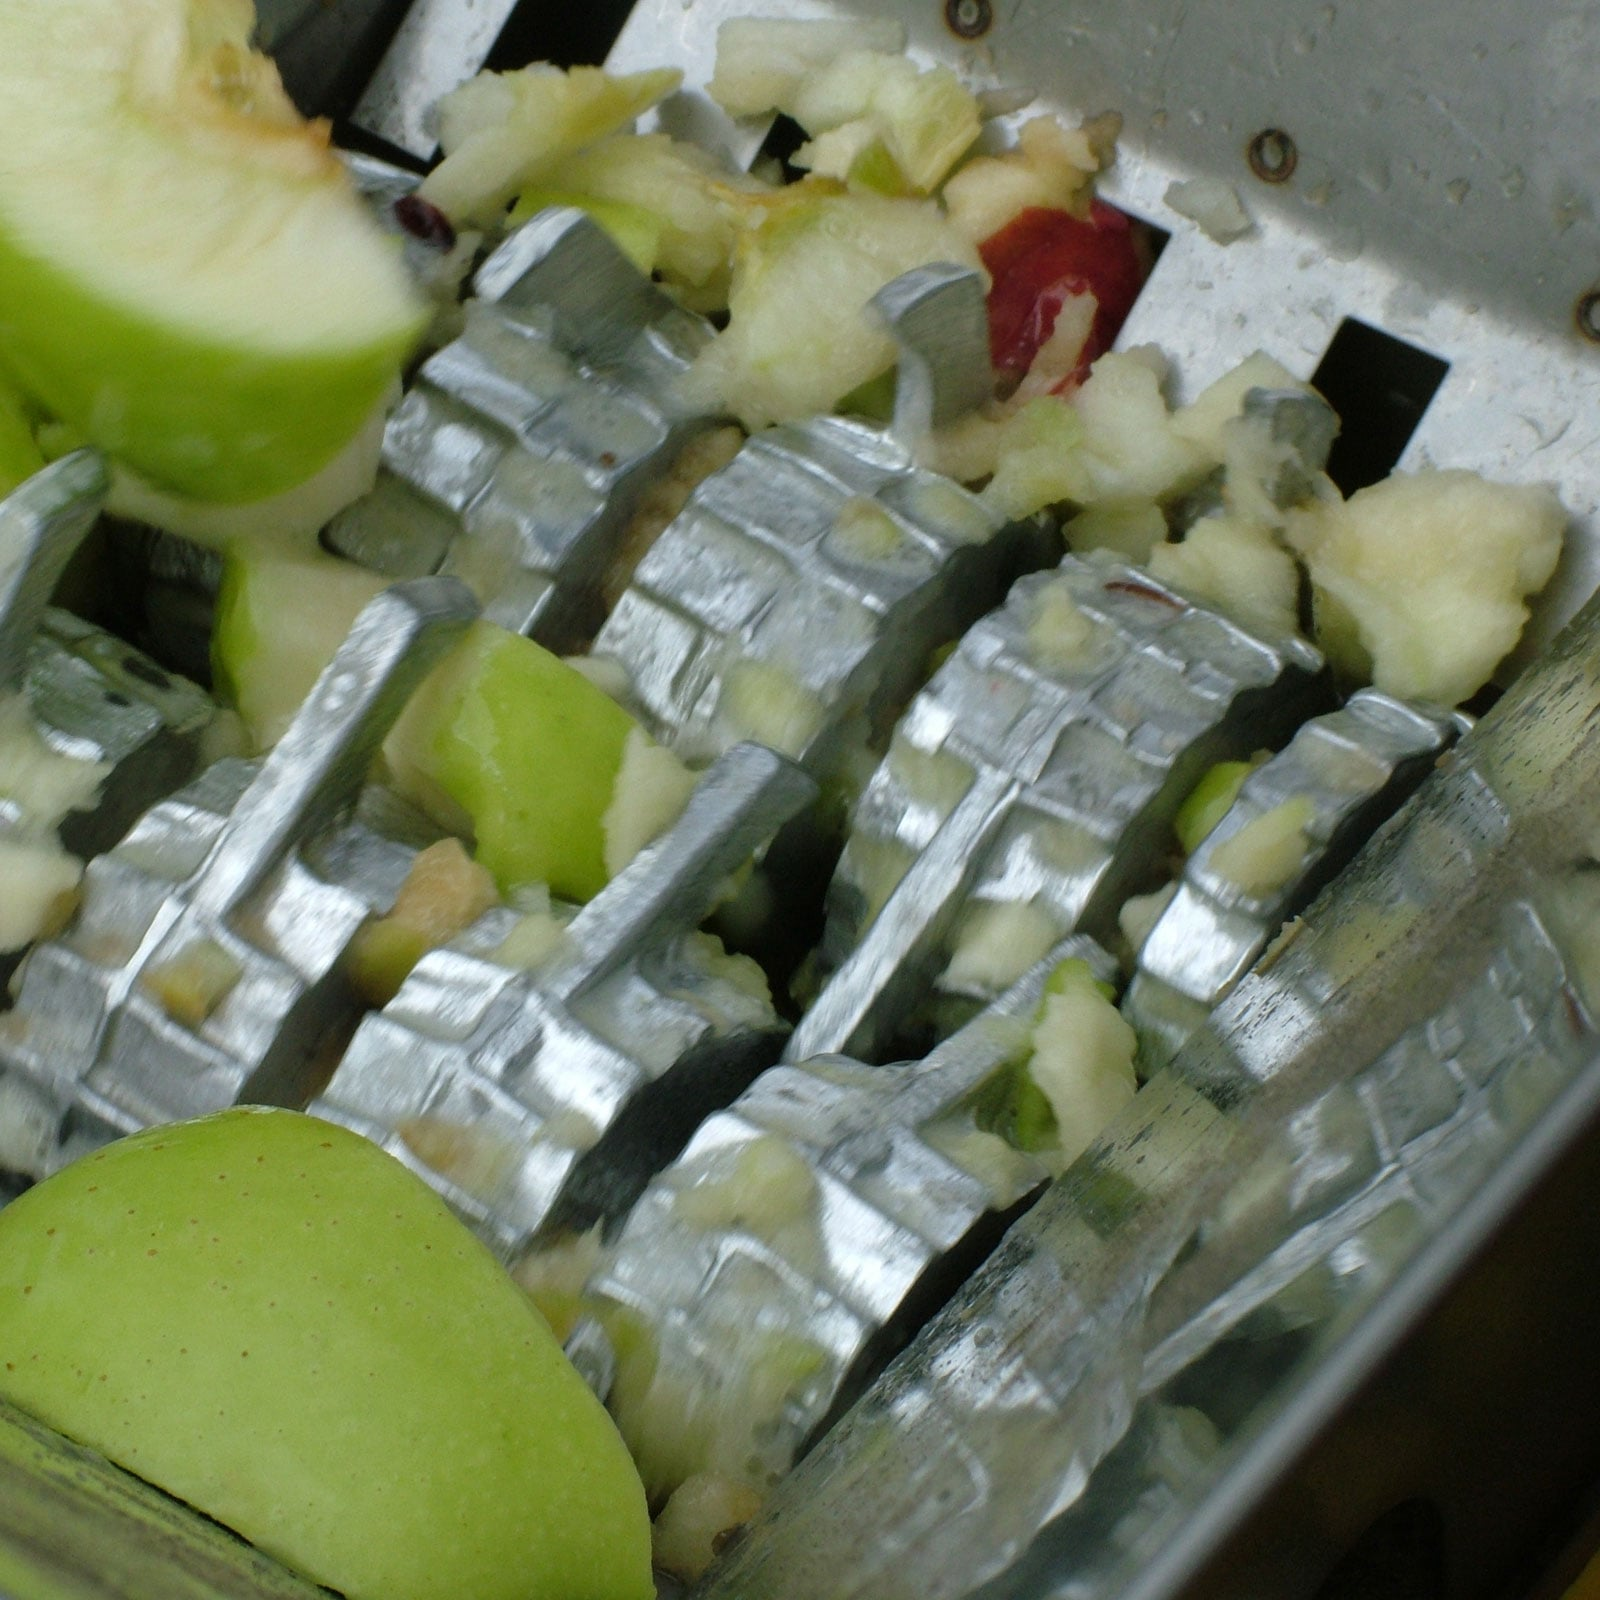 Fruit Crusher Harrod Horticultural Uk